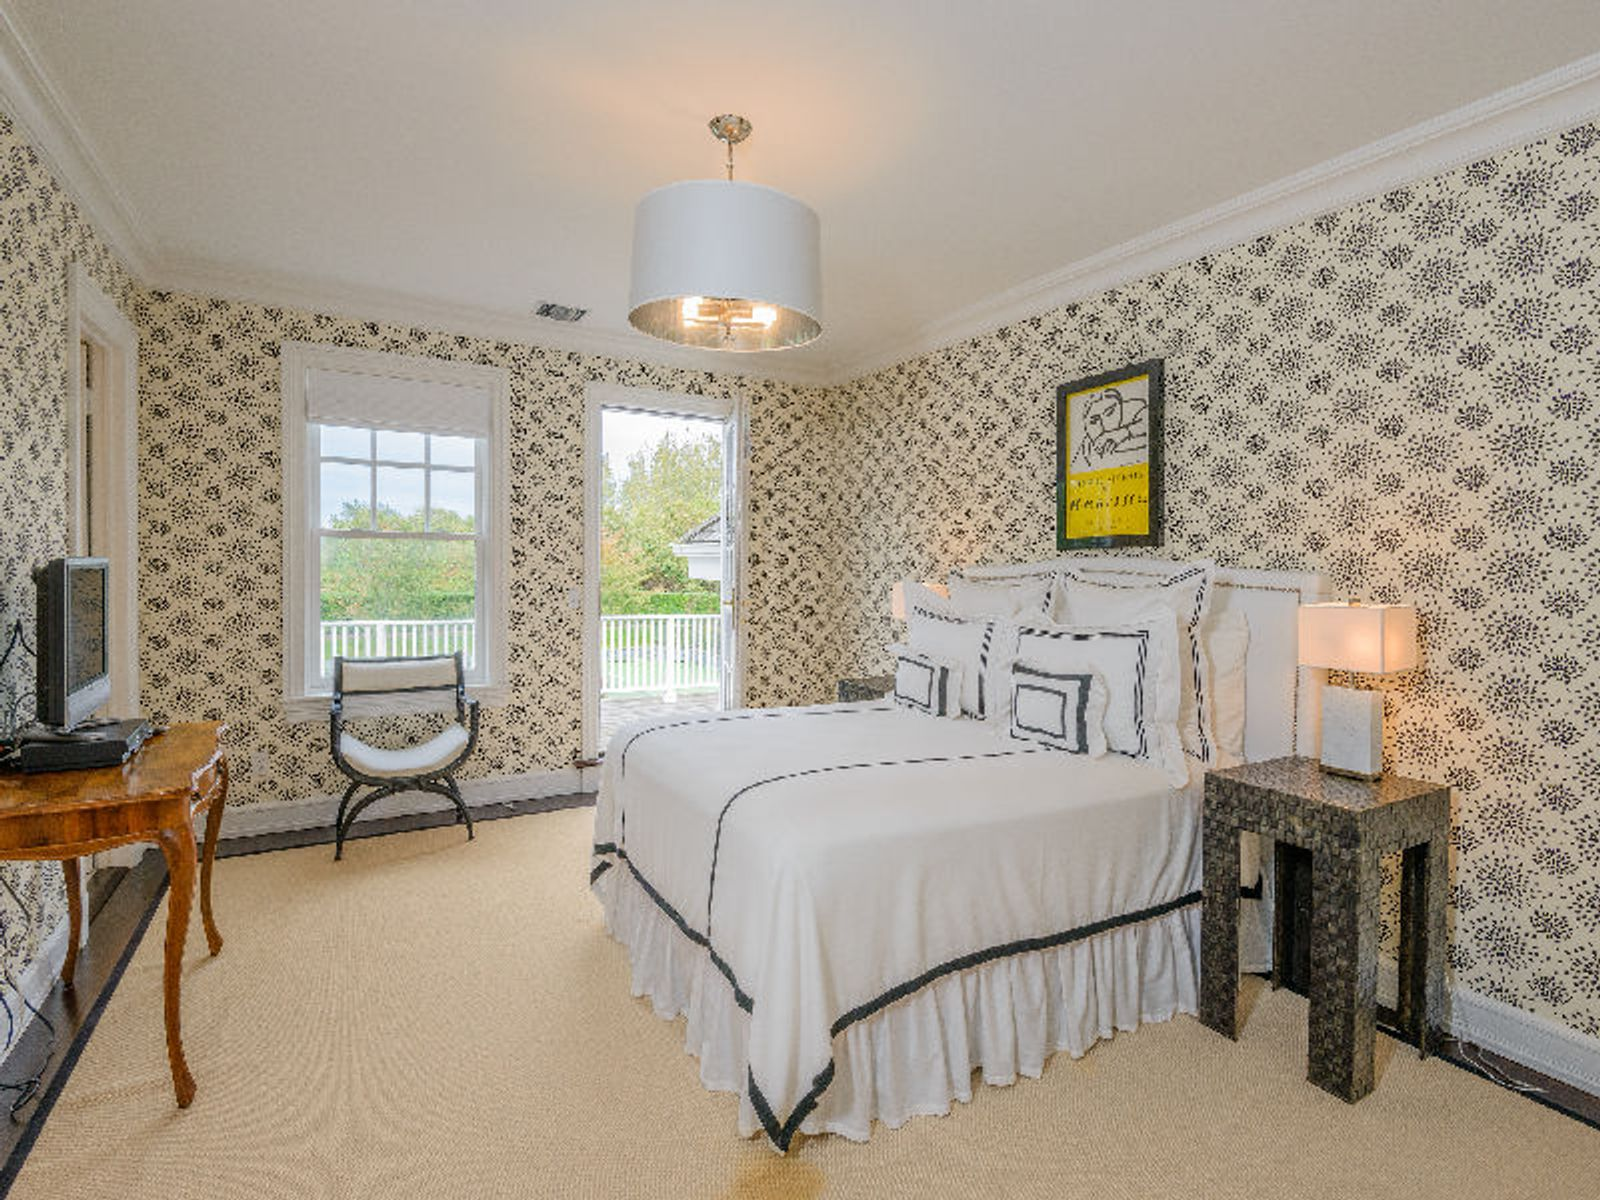 Southampton Village - Spacious Home